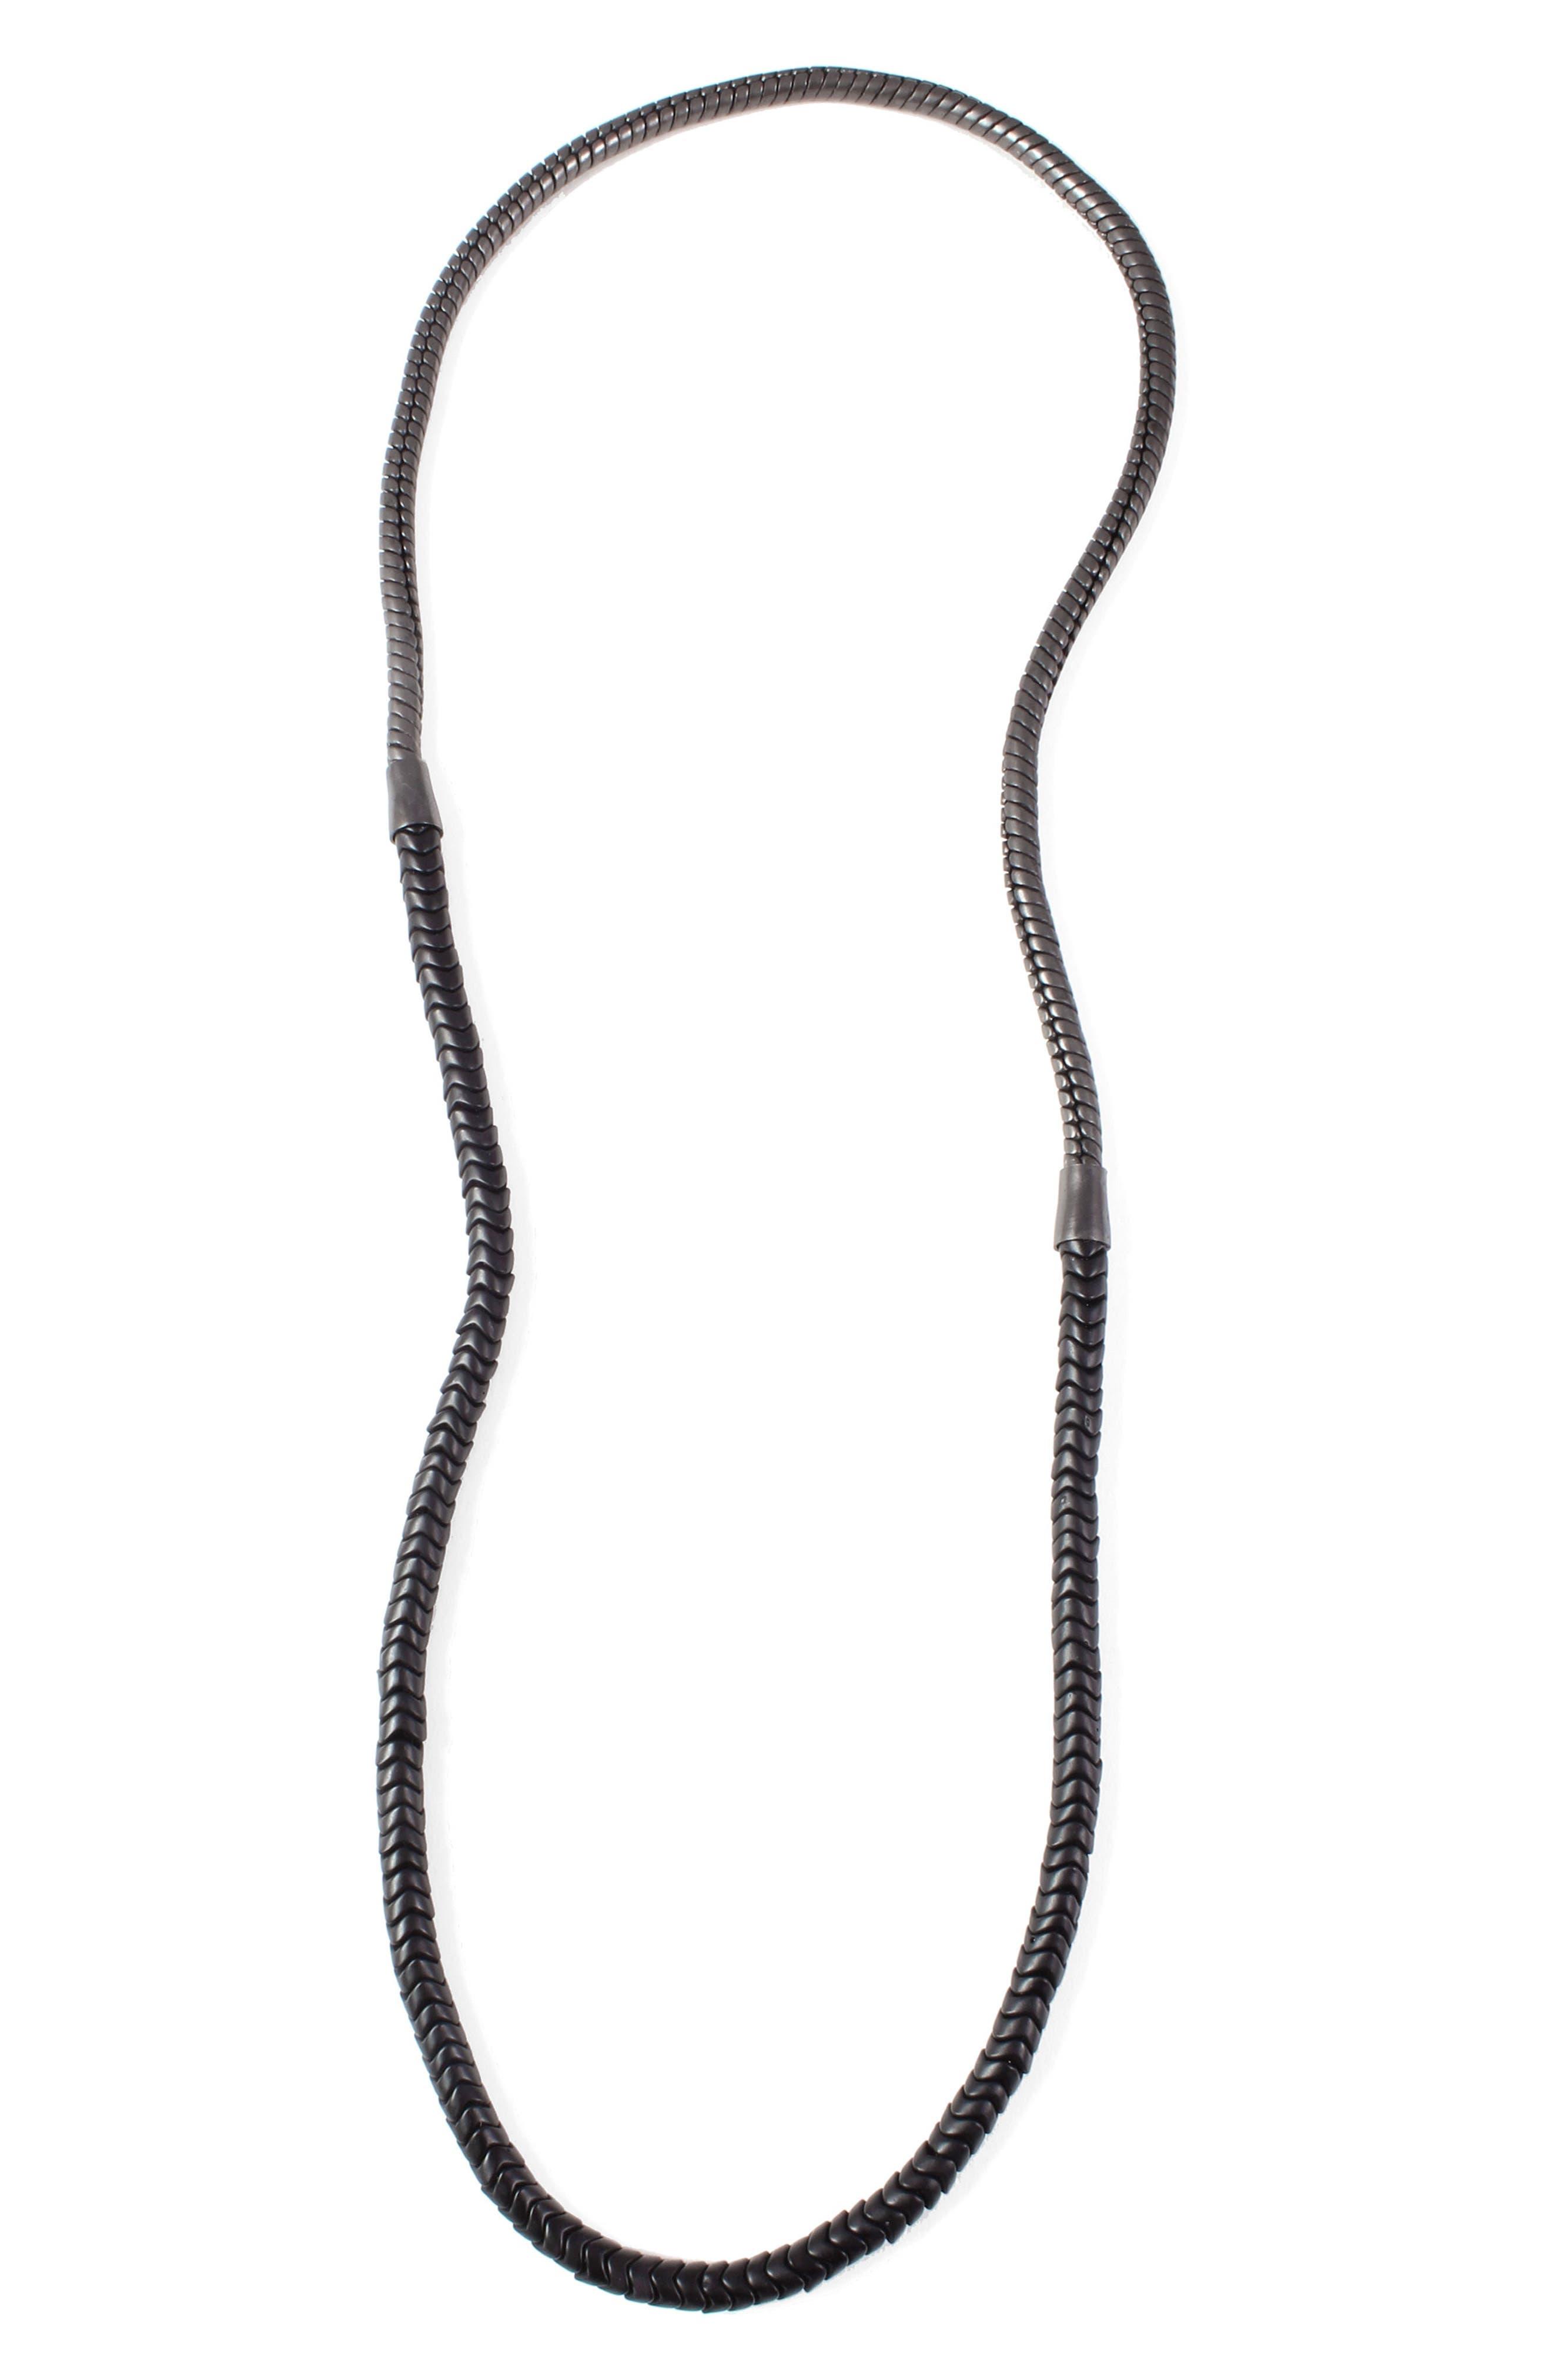 50/50 Necklace,                             Main thumbnail 1, color,                             001